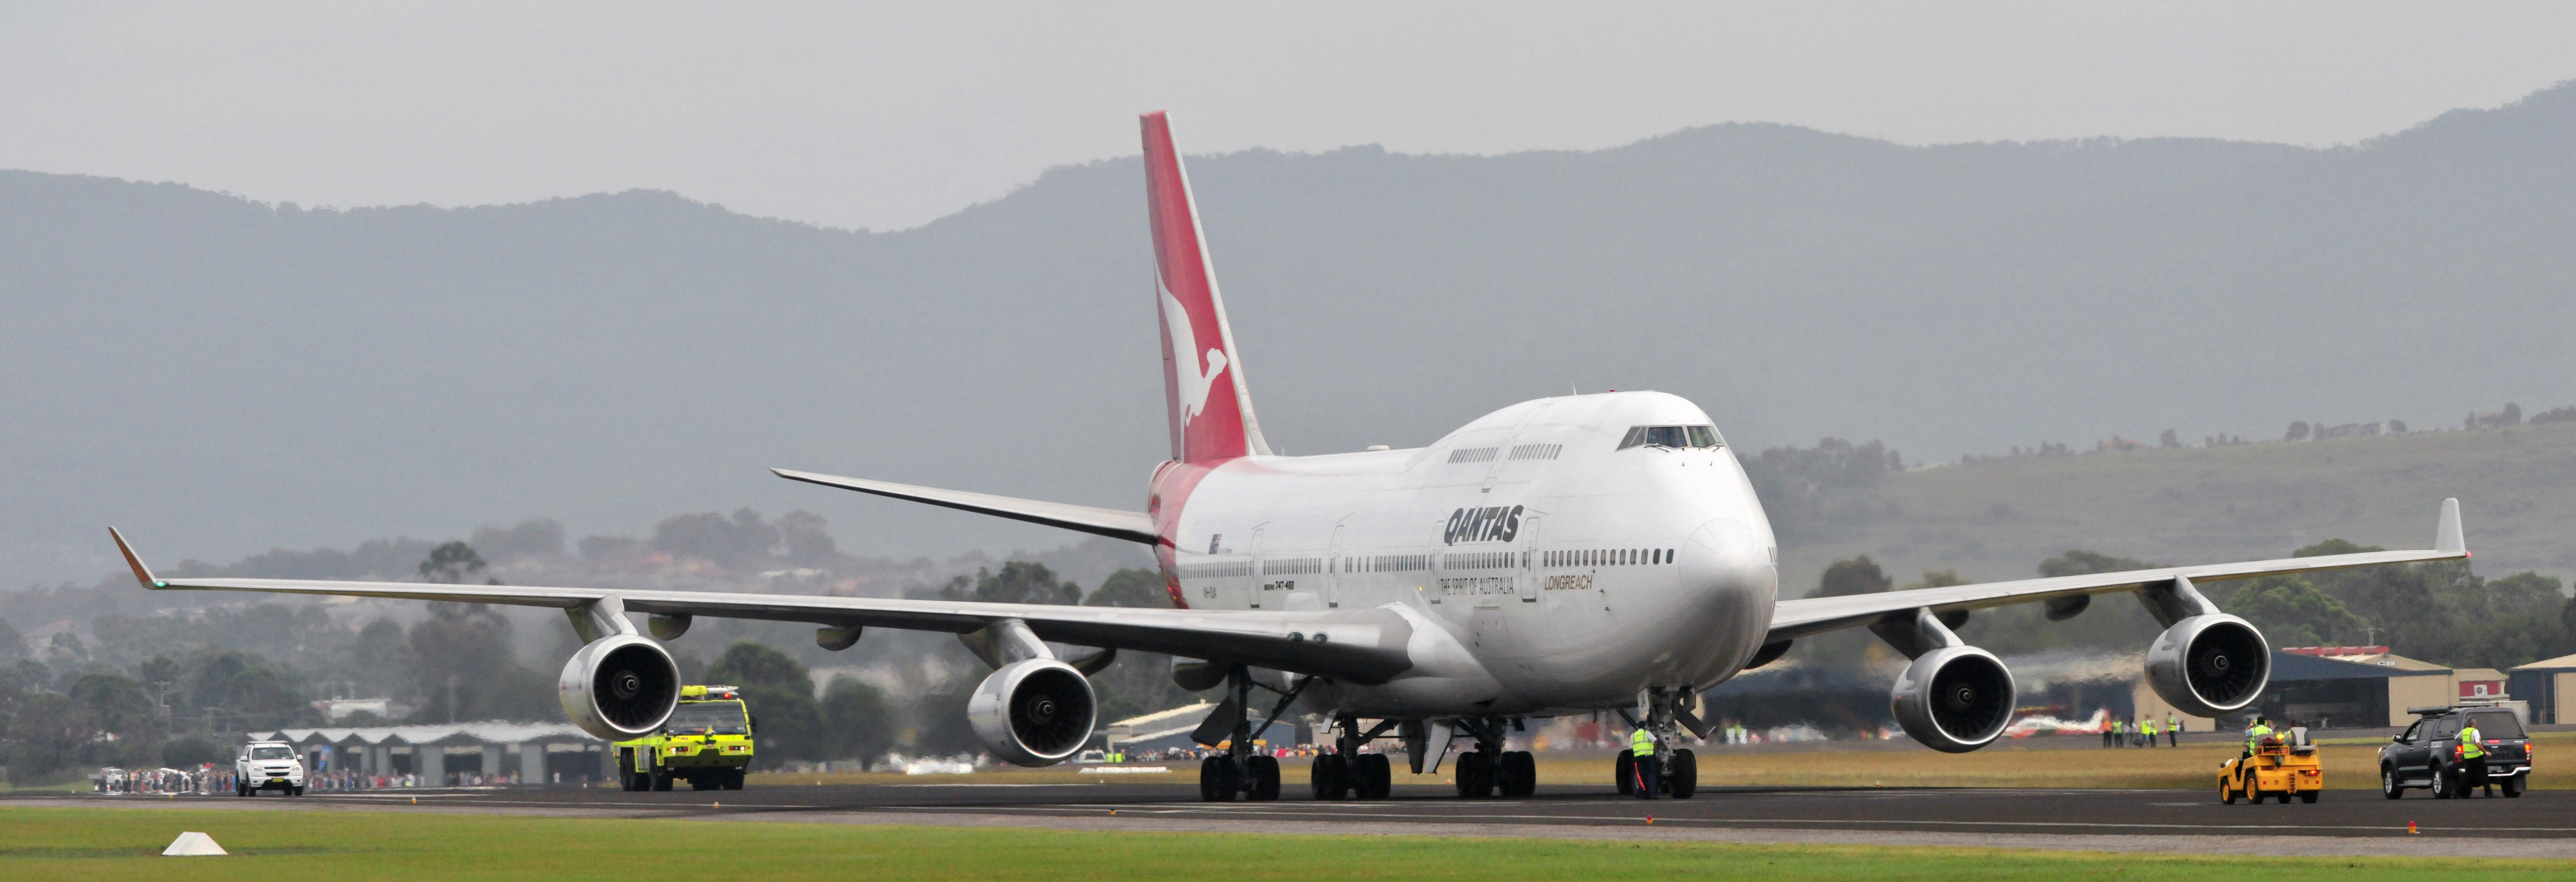 John travolta 747